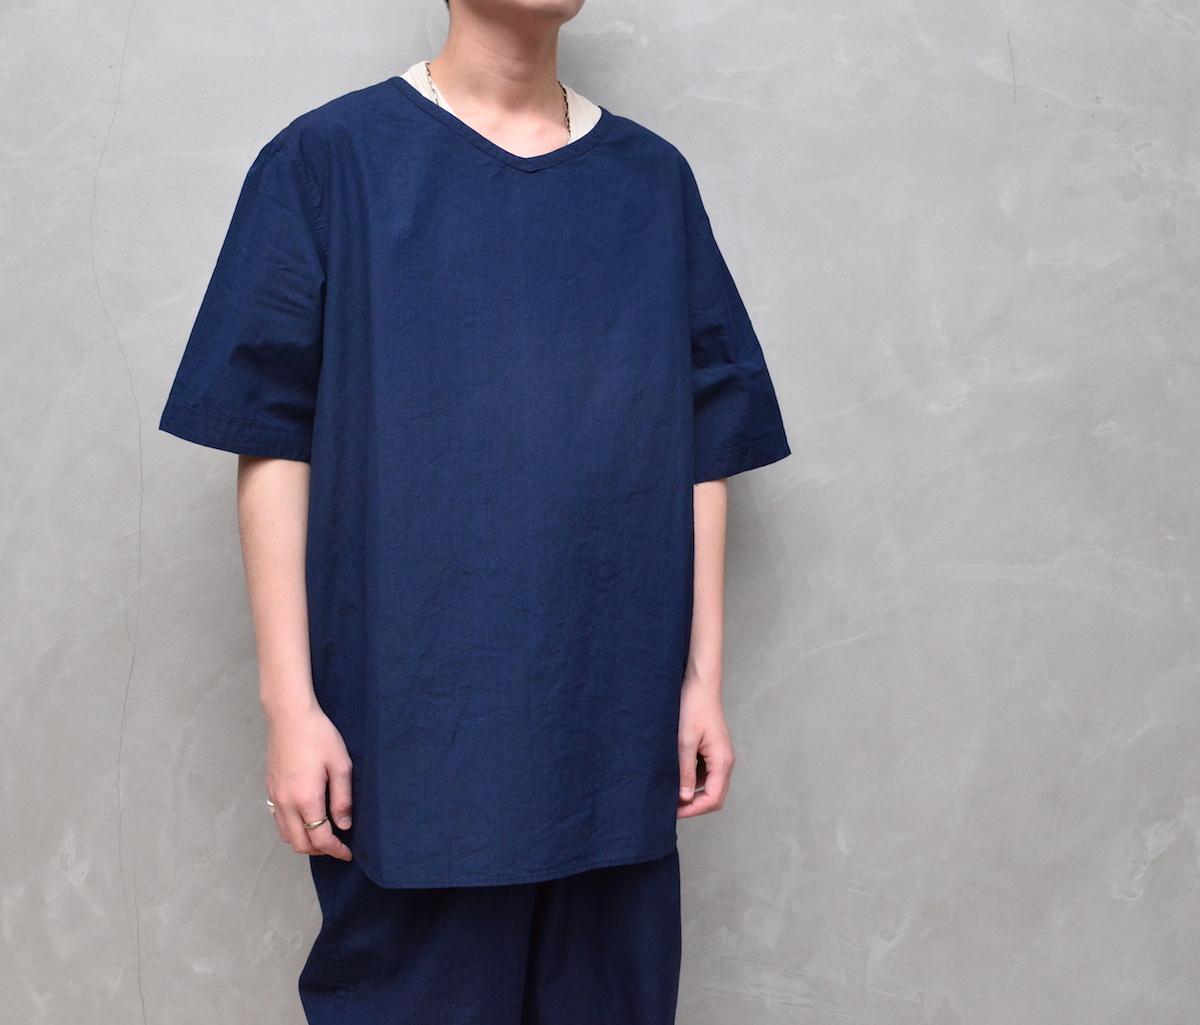 AUGUSTE-PRESENTATION PajamaLook 「 ダンガリー半袖プルオーバー / INDIGO 」